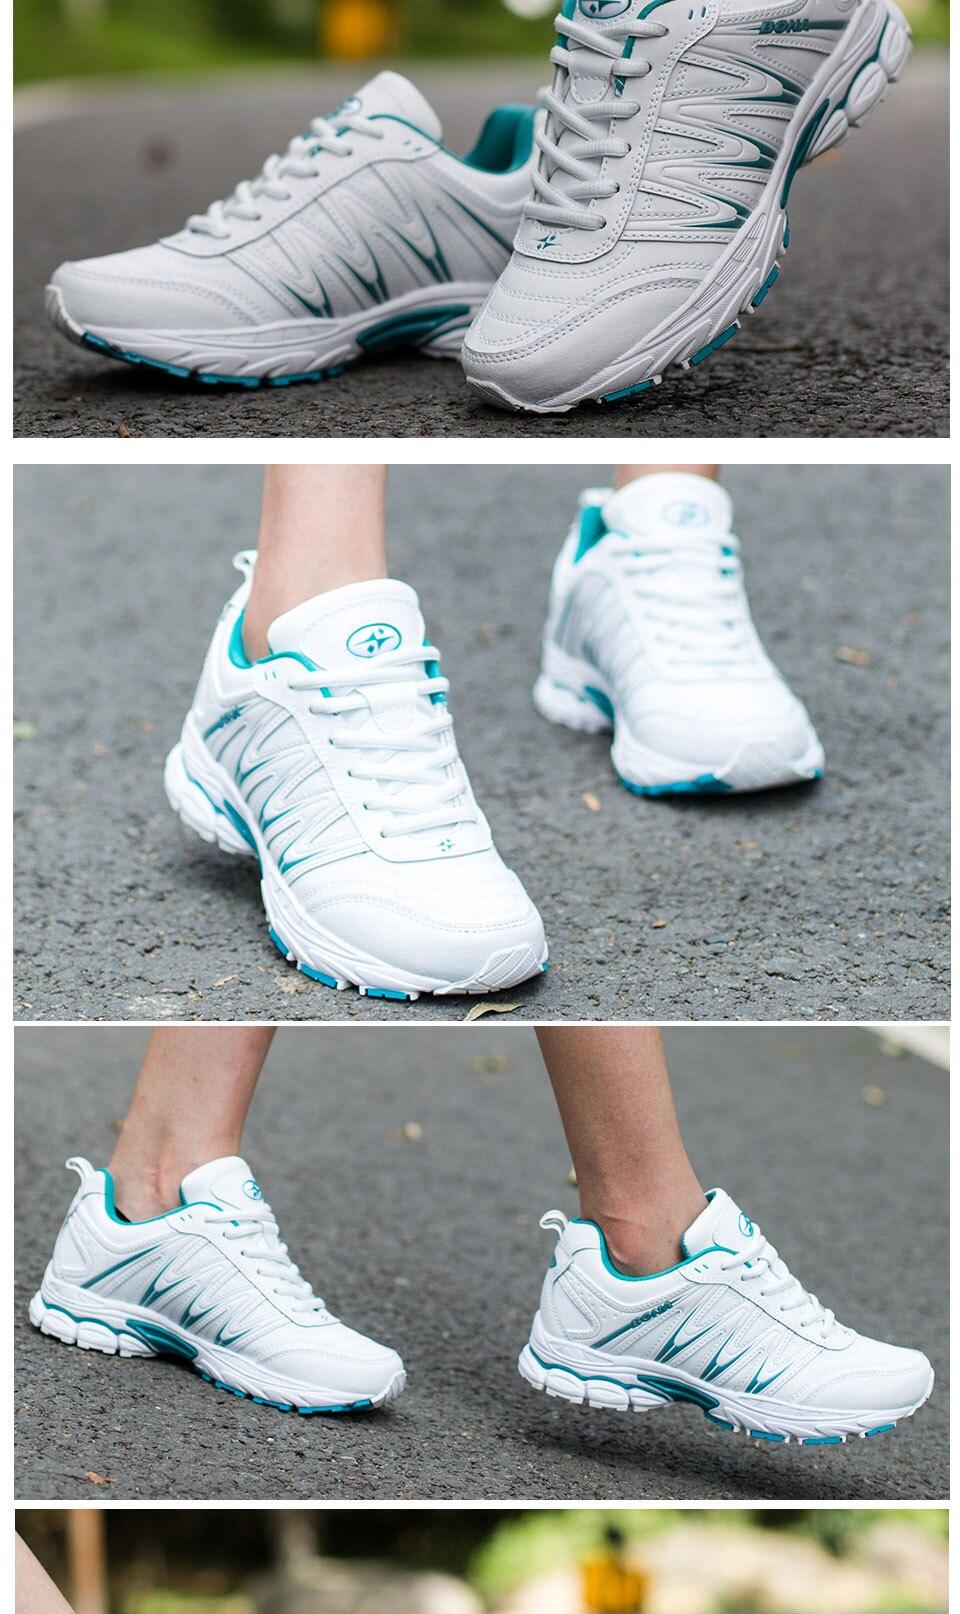 H1e0c9935a290480e8b245aa92c2a92a8m BONA 2019 New Designers Casual Shoes Men Style Cow Split Sneakers Male Lightweight Outdoor Fashion Footwear Man Trendy Comfy